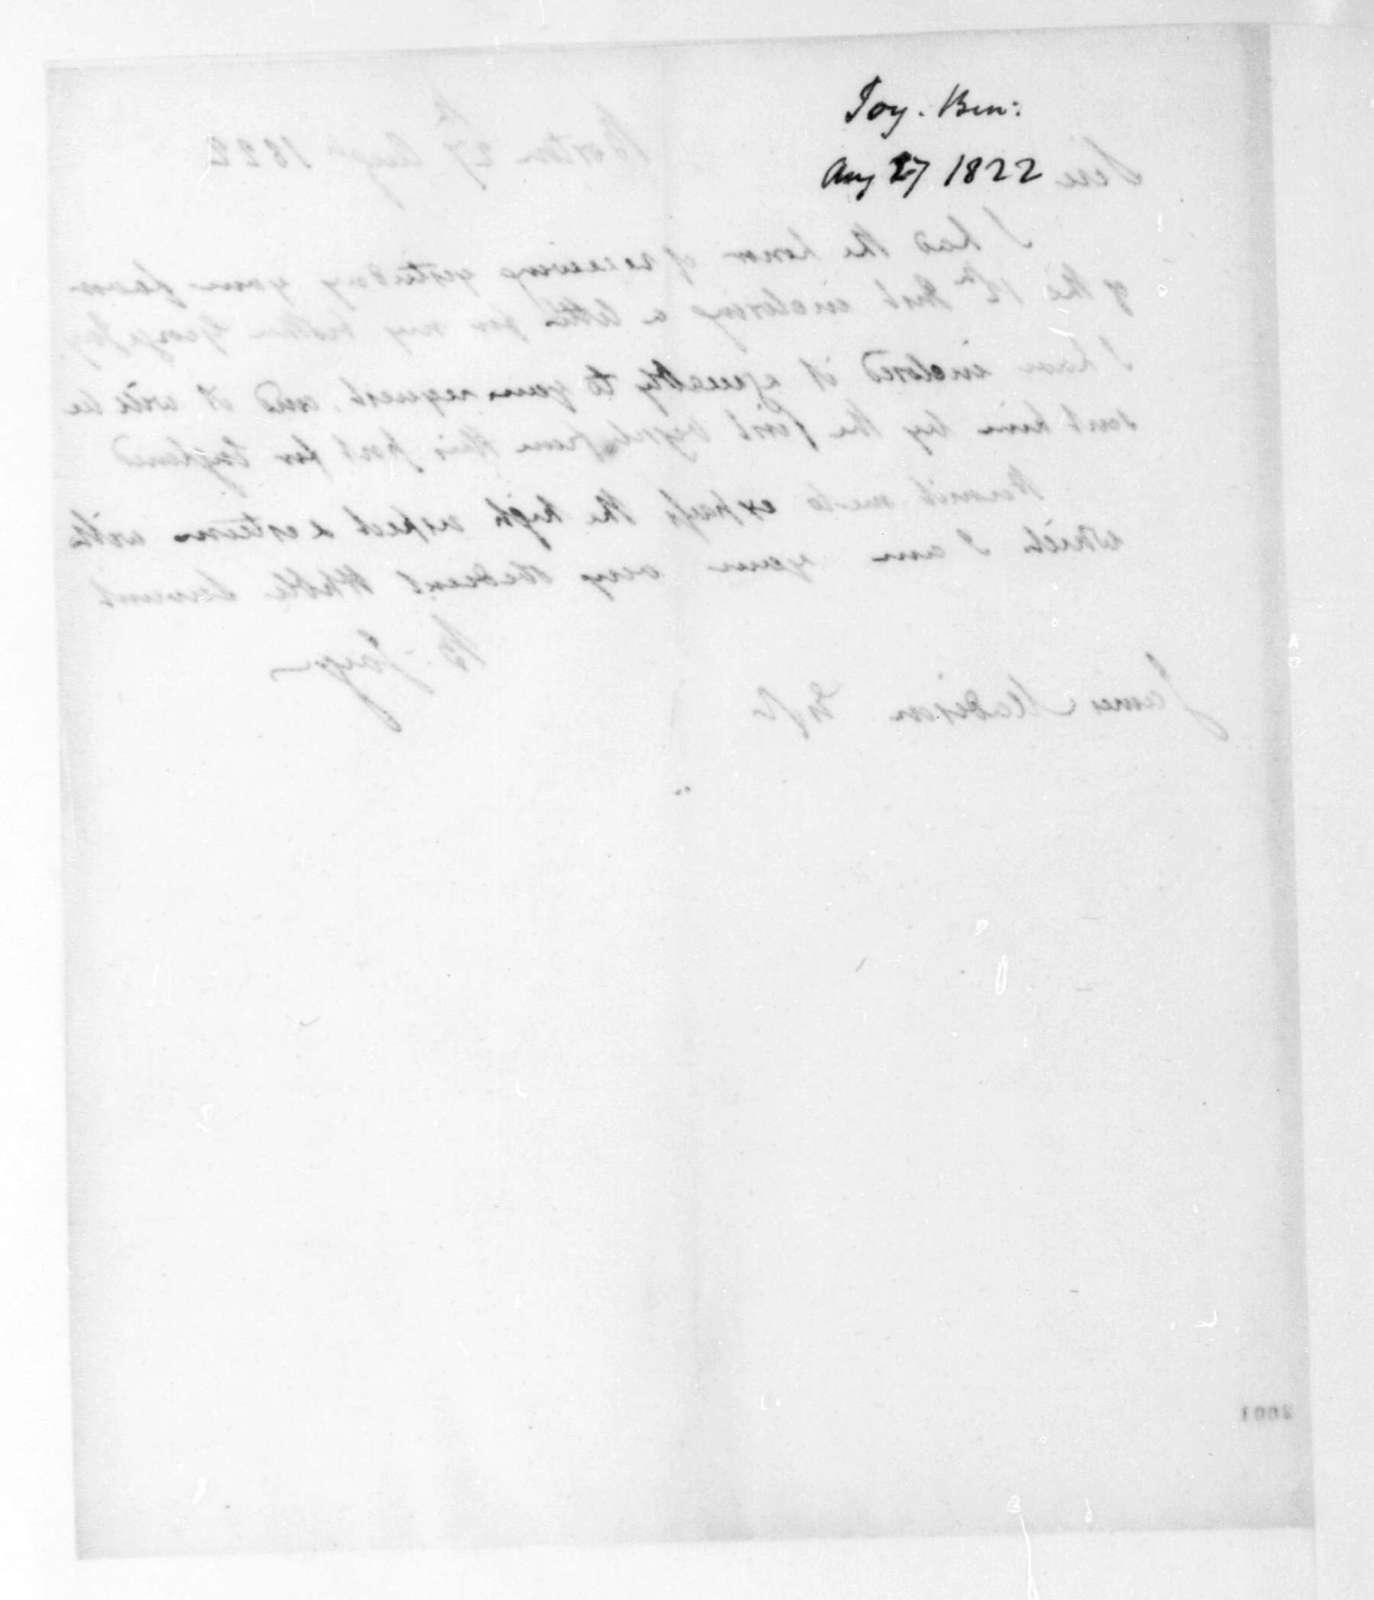 Benjamin Joy to James Madison, August 27, 1822.